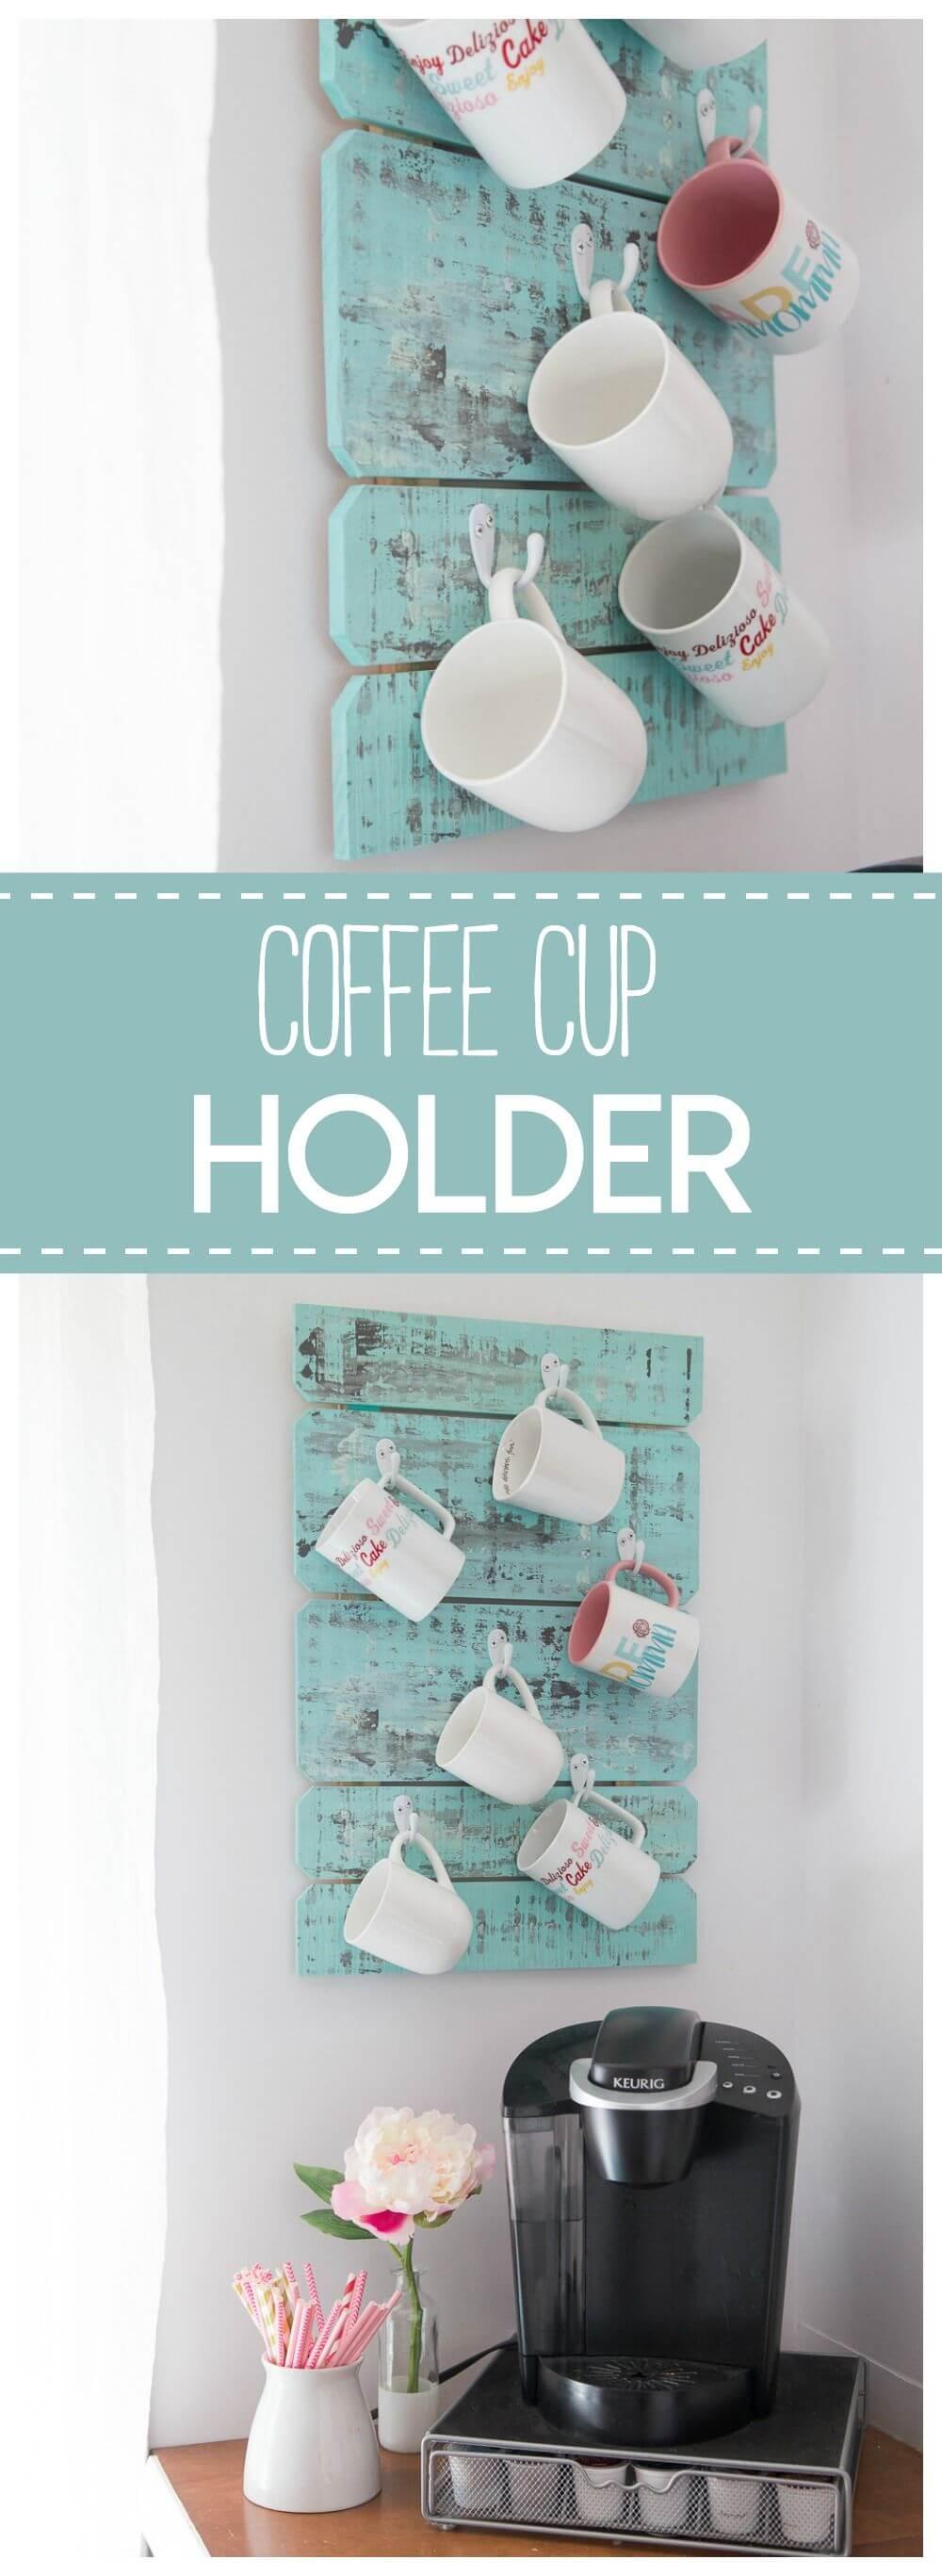 Coffee Mugs Hung on Rustic Planks